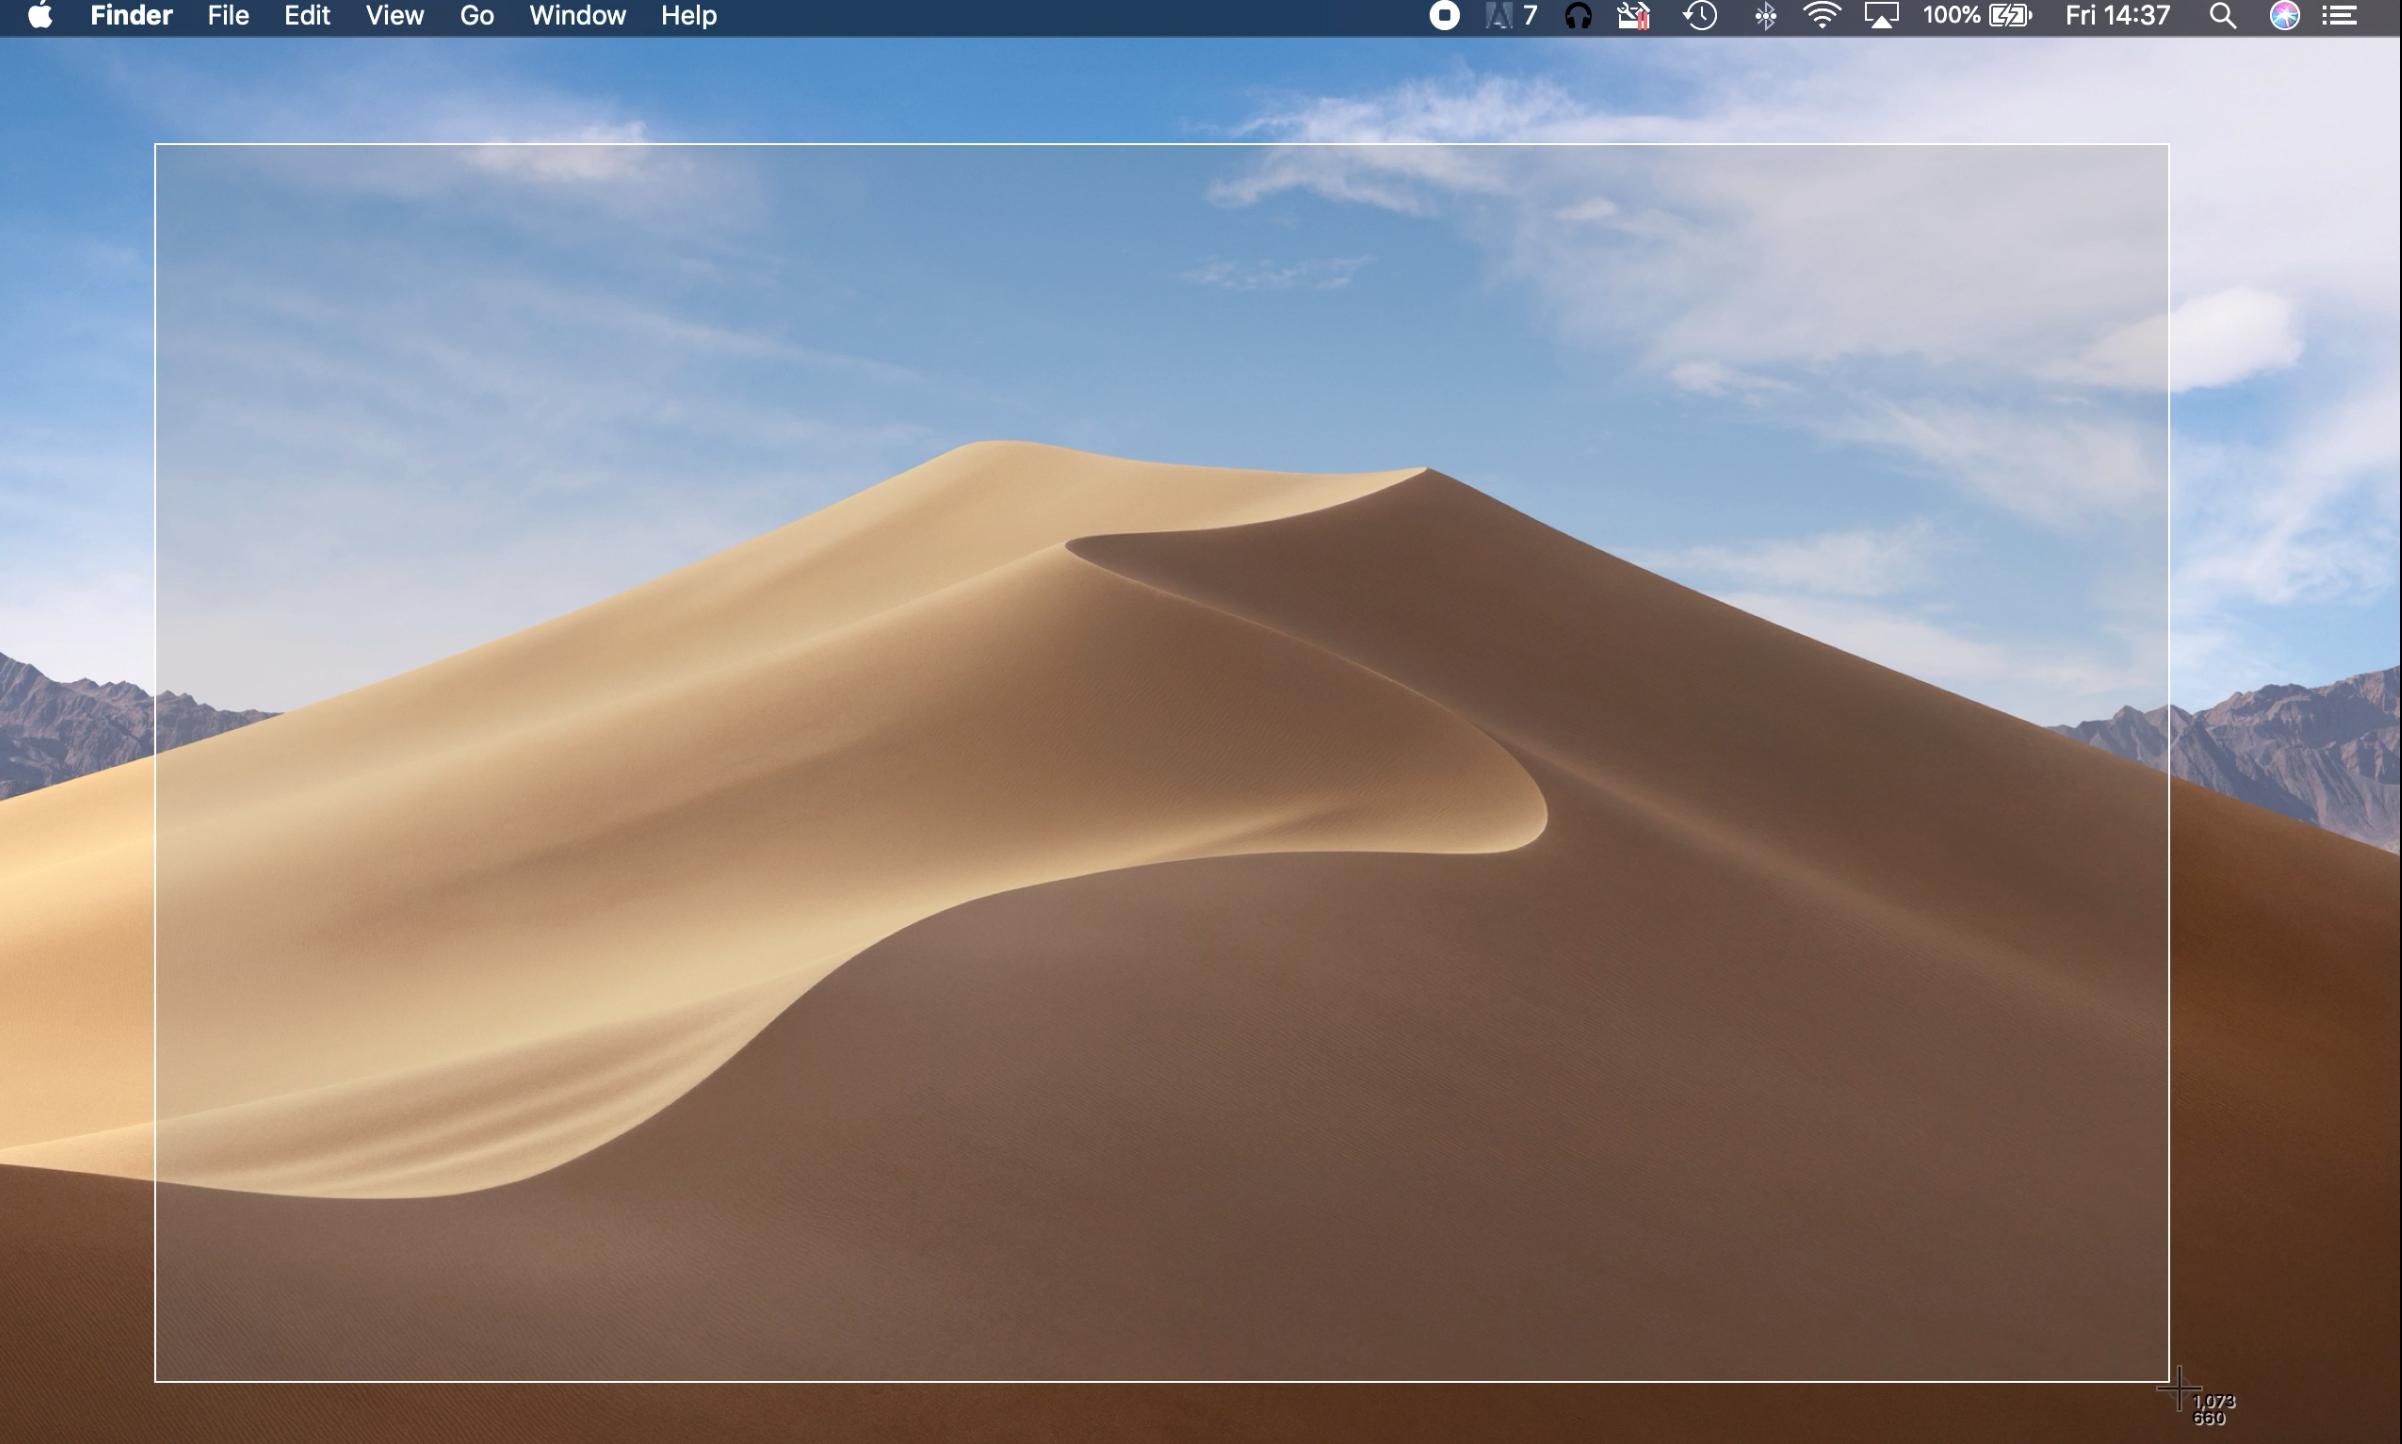 Take a screenshot of part of the screen